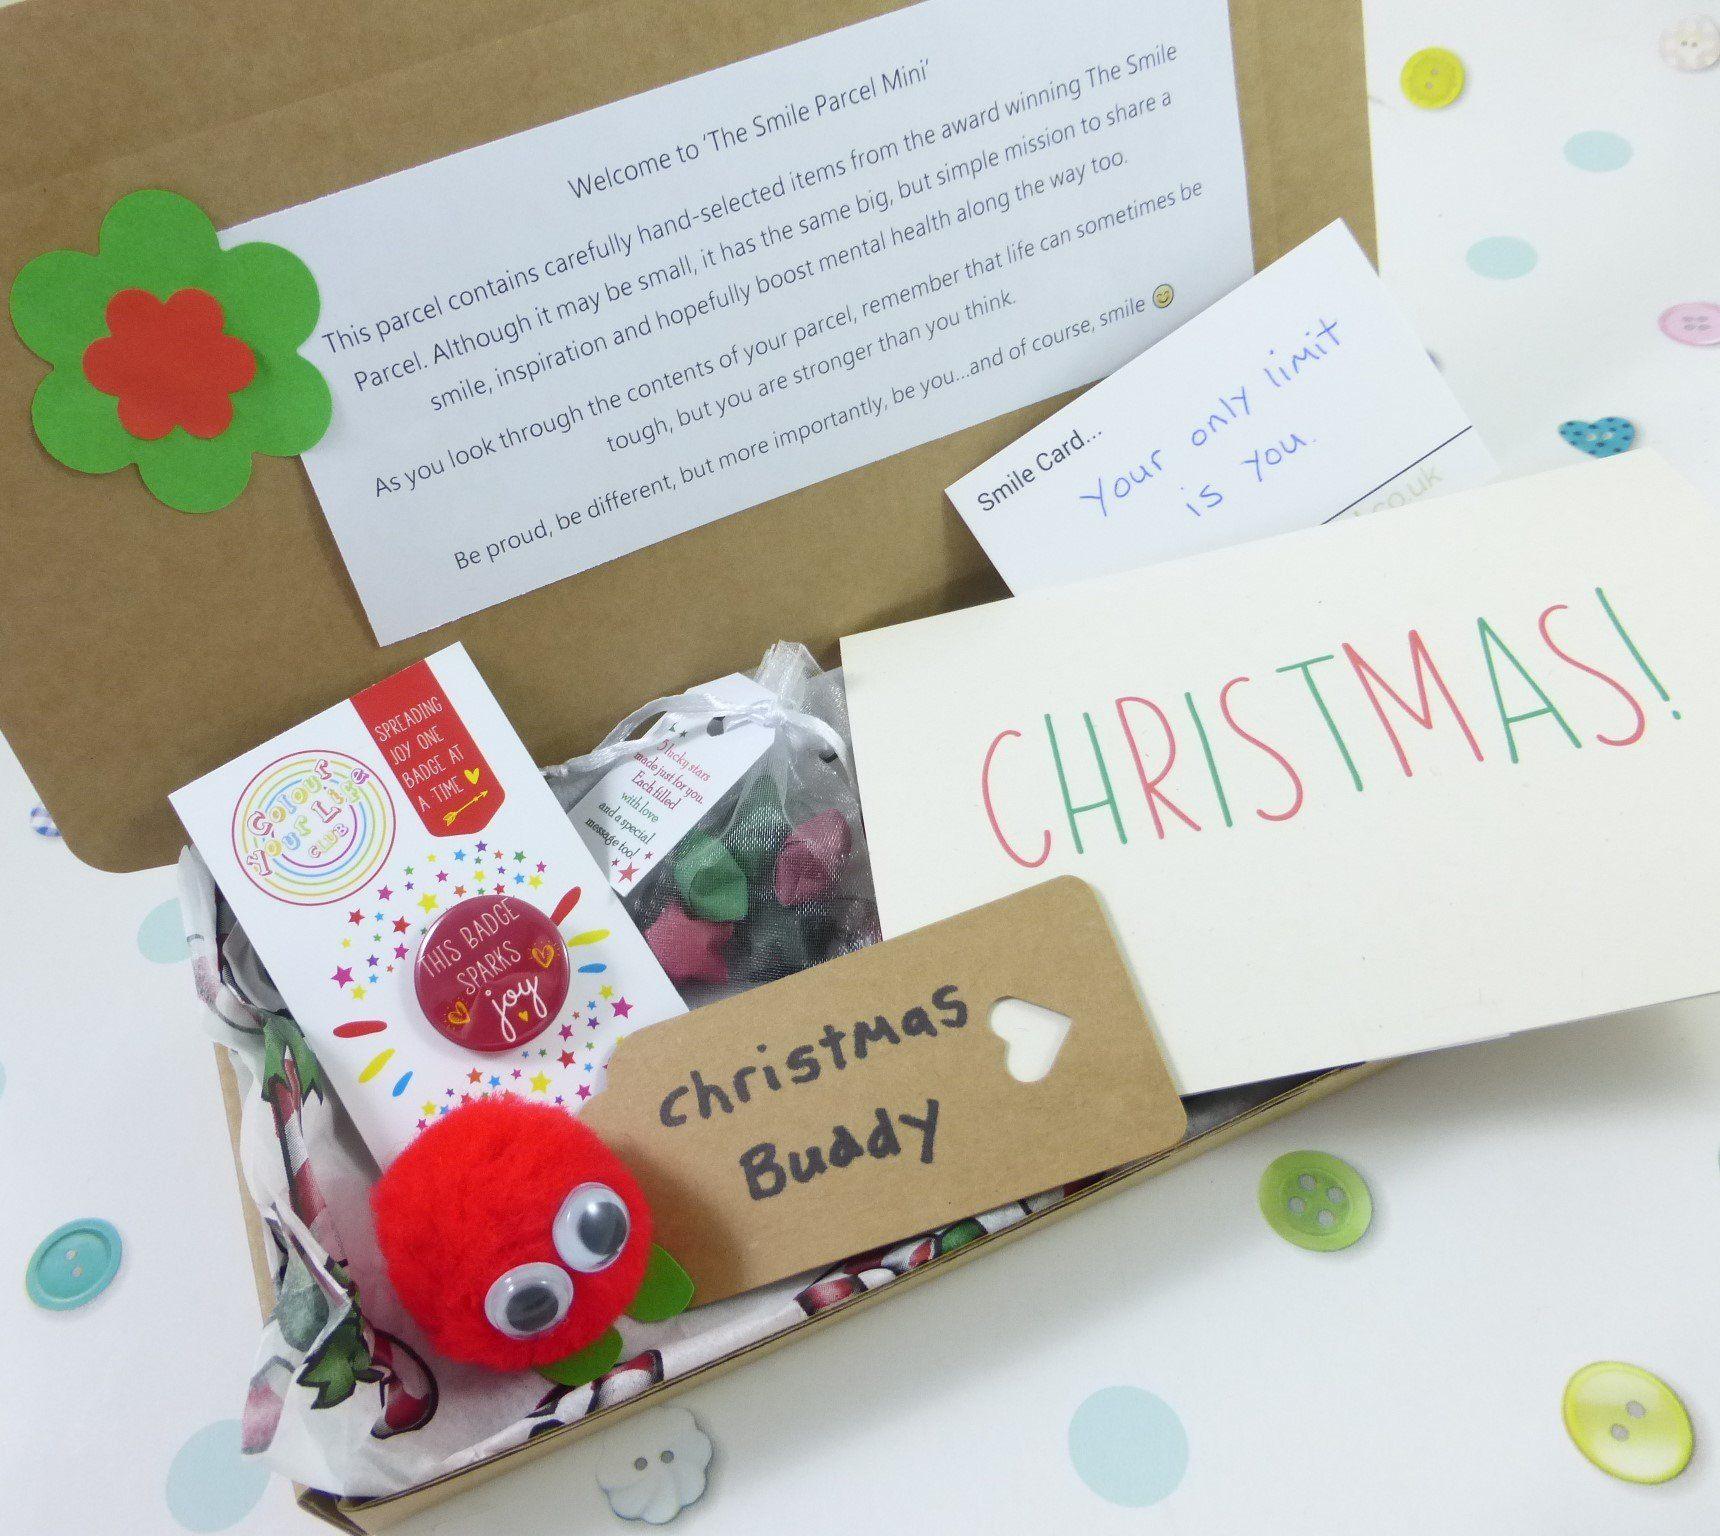 Christmas, Letterbox Friendly, Pick Me Up Gift – The Smile Parcel Mini Kind Shop